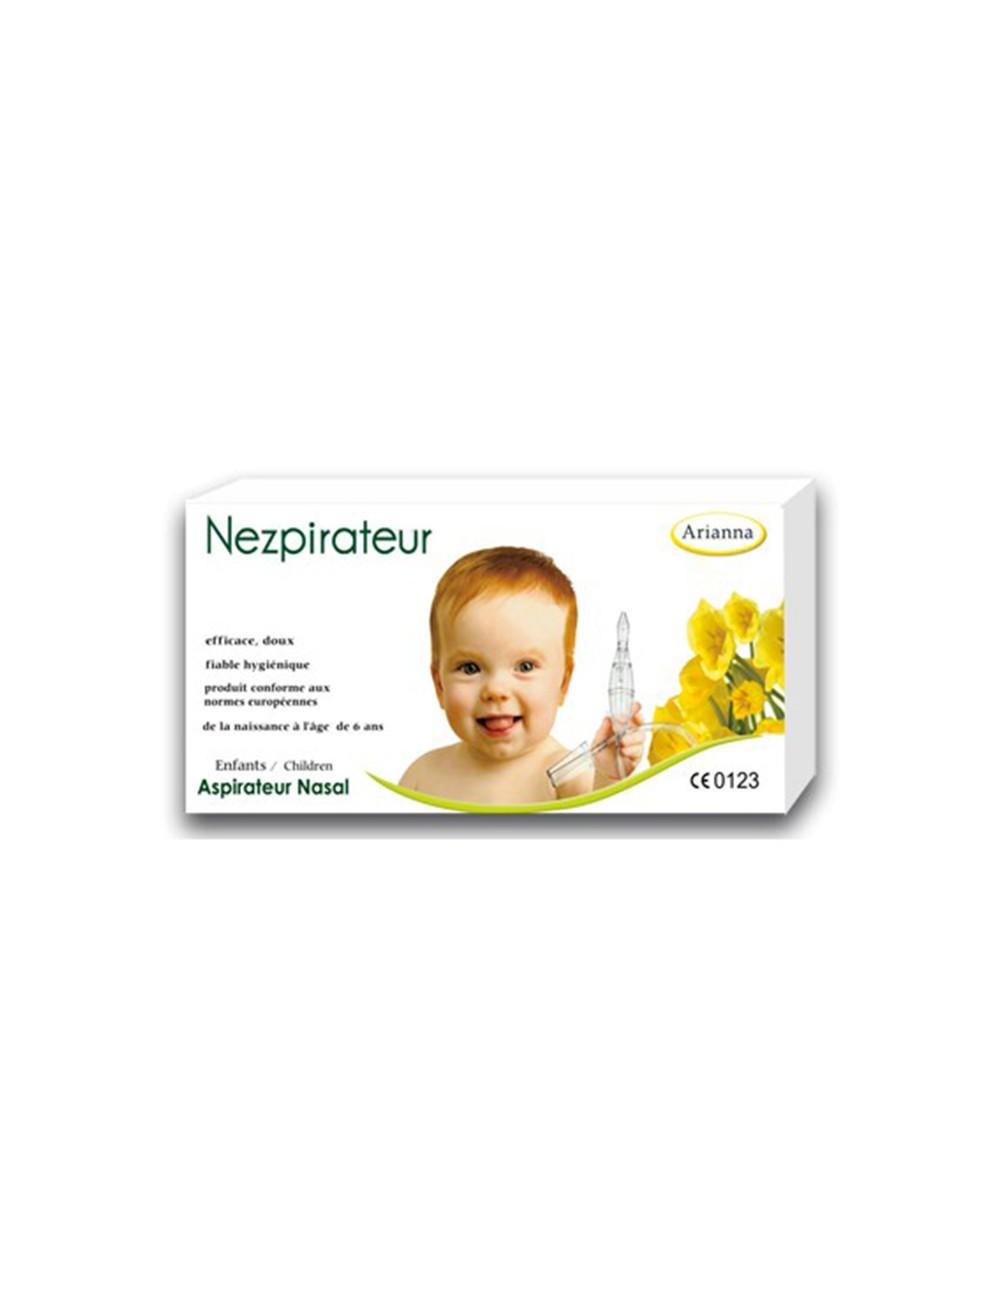 Nezpirateur aspirateur nasale Arianna